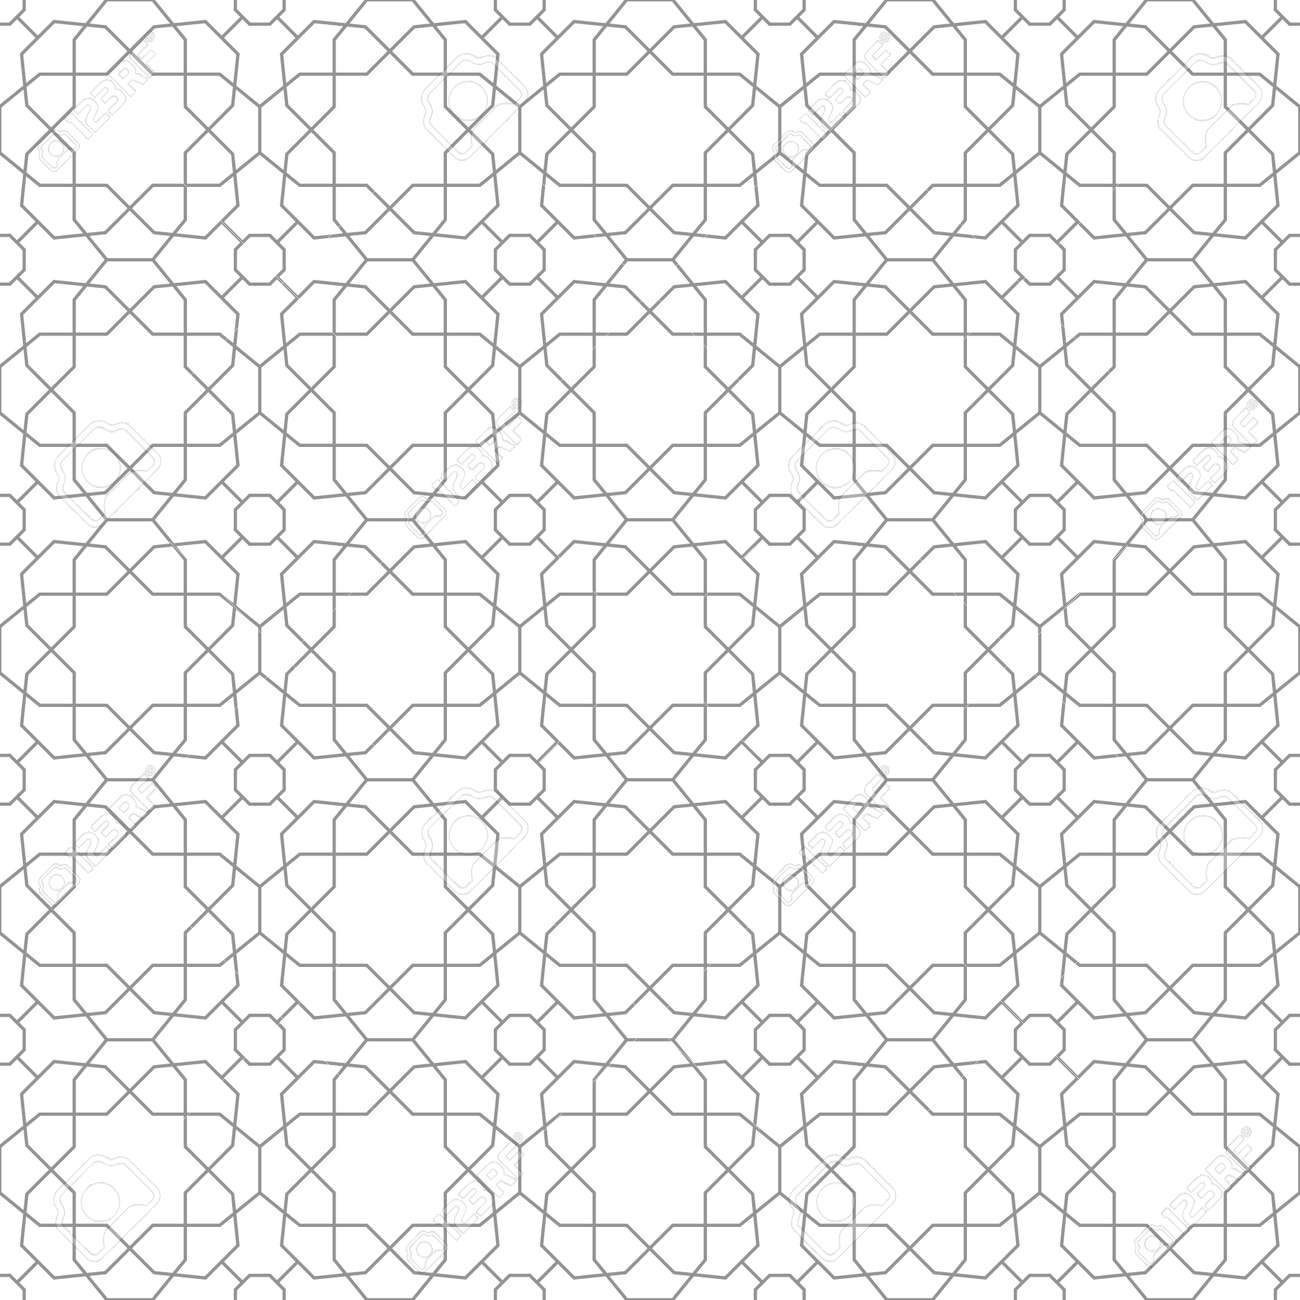 Geometric abstract vector pattern. Geometric modern ornament. Seamless modern silver background - 169499806